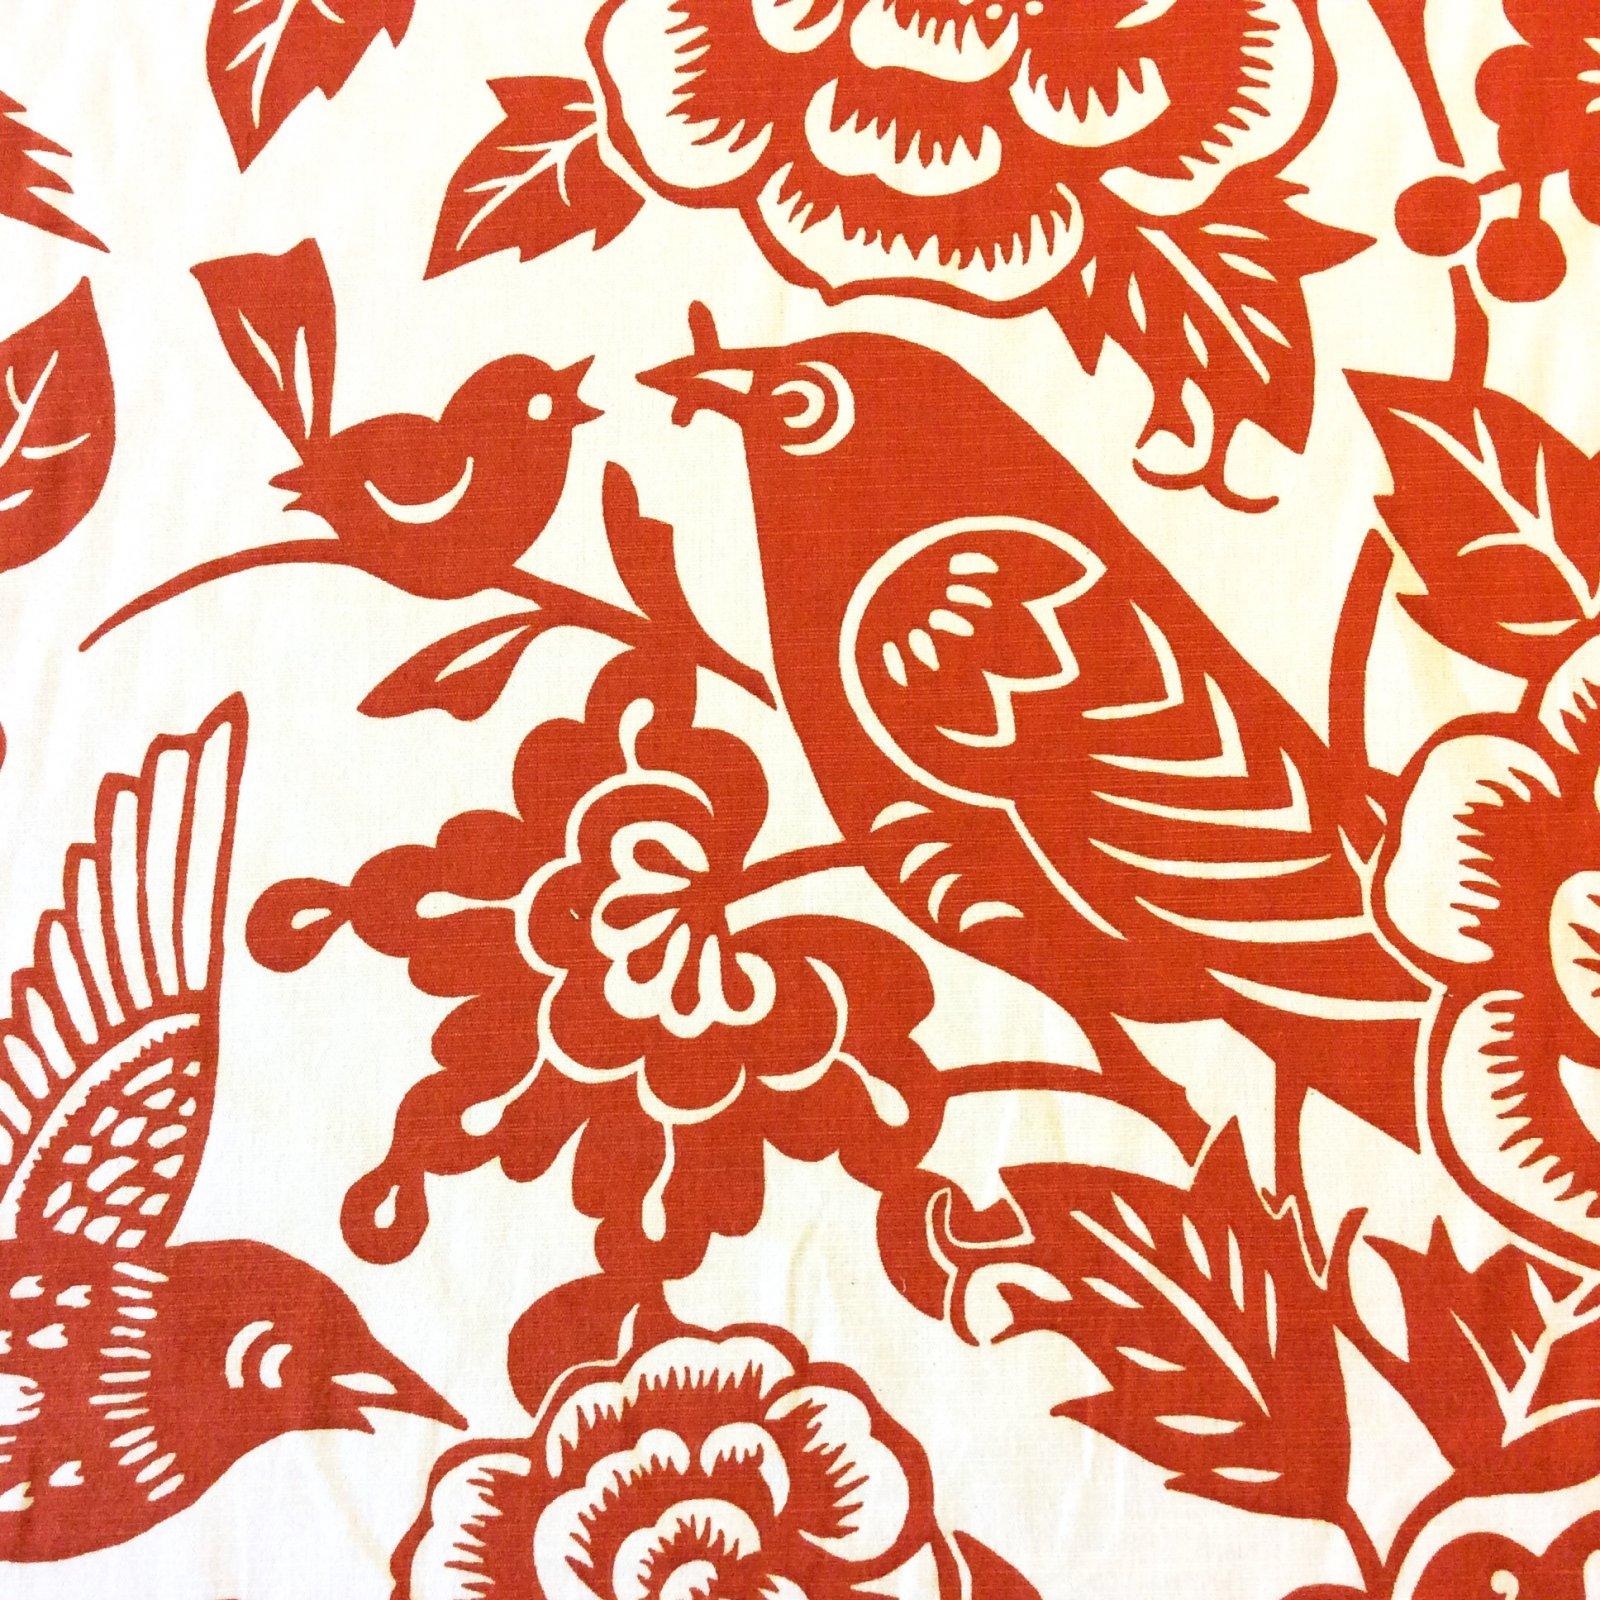 Thomas Paul Modern Graphic Silouhette Print Bird Floral Woodcut